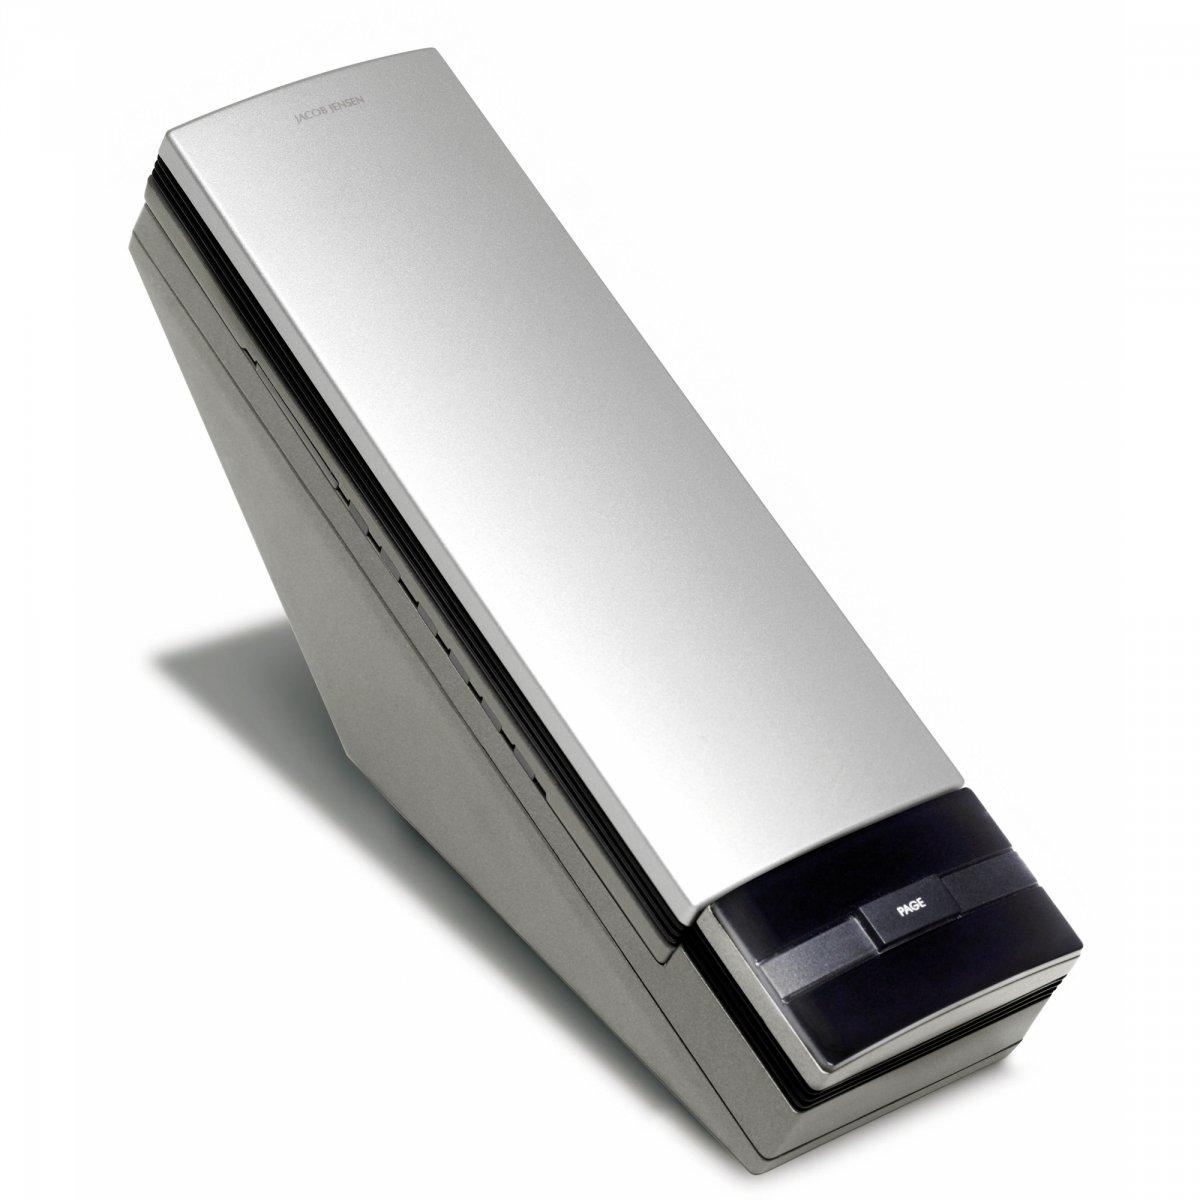 Genial Scintillating Designer Cordless Home Phones Images   Exterior Ideas .